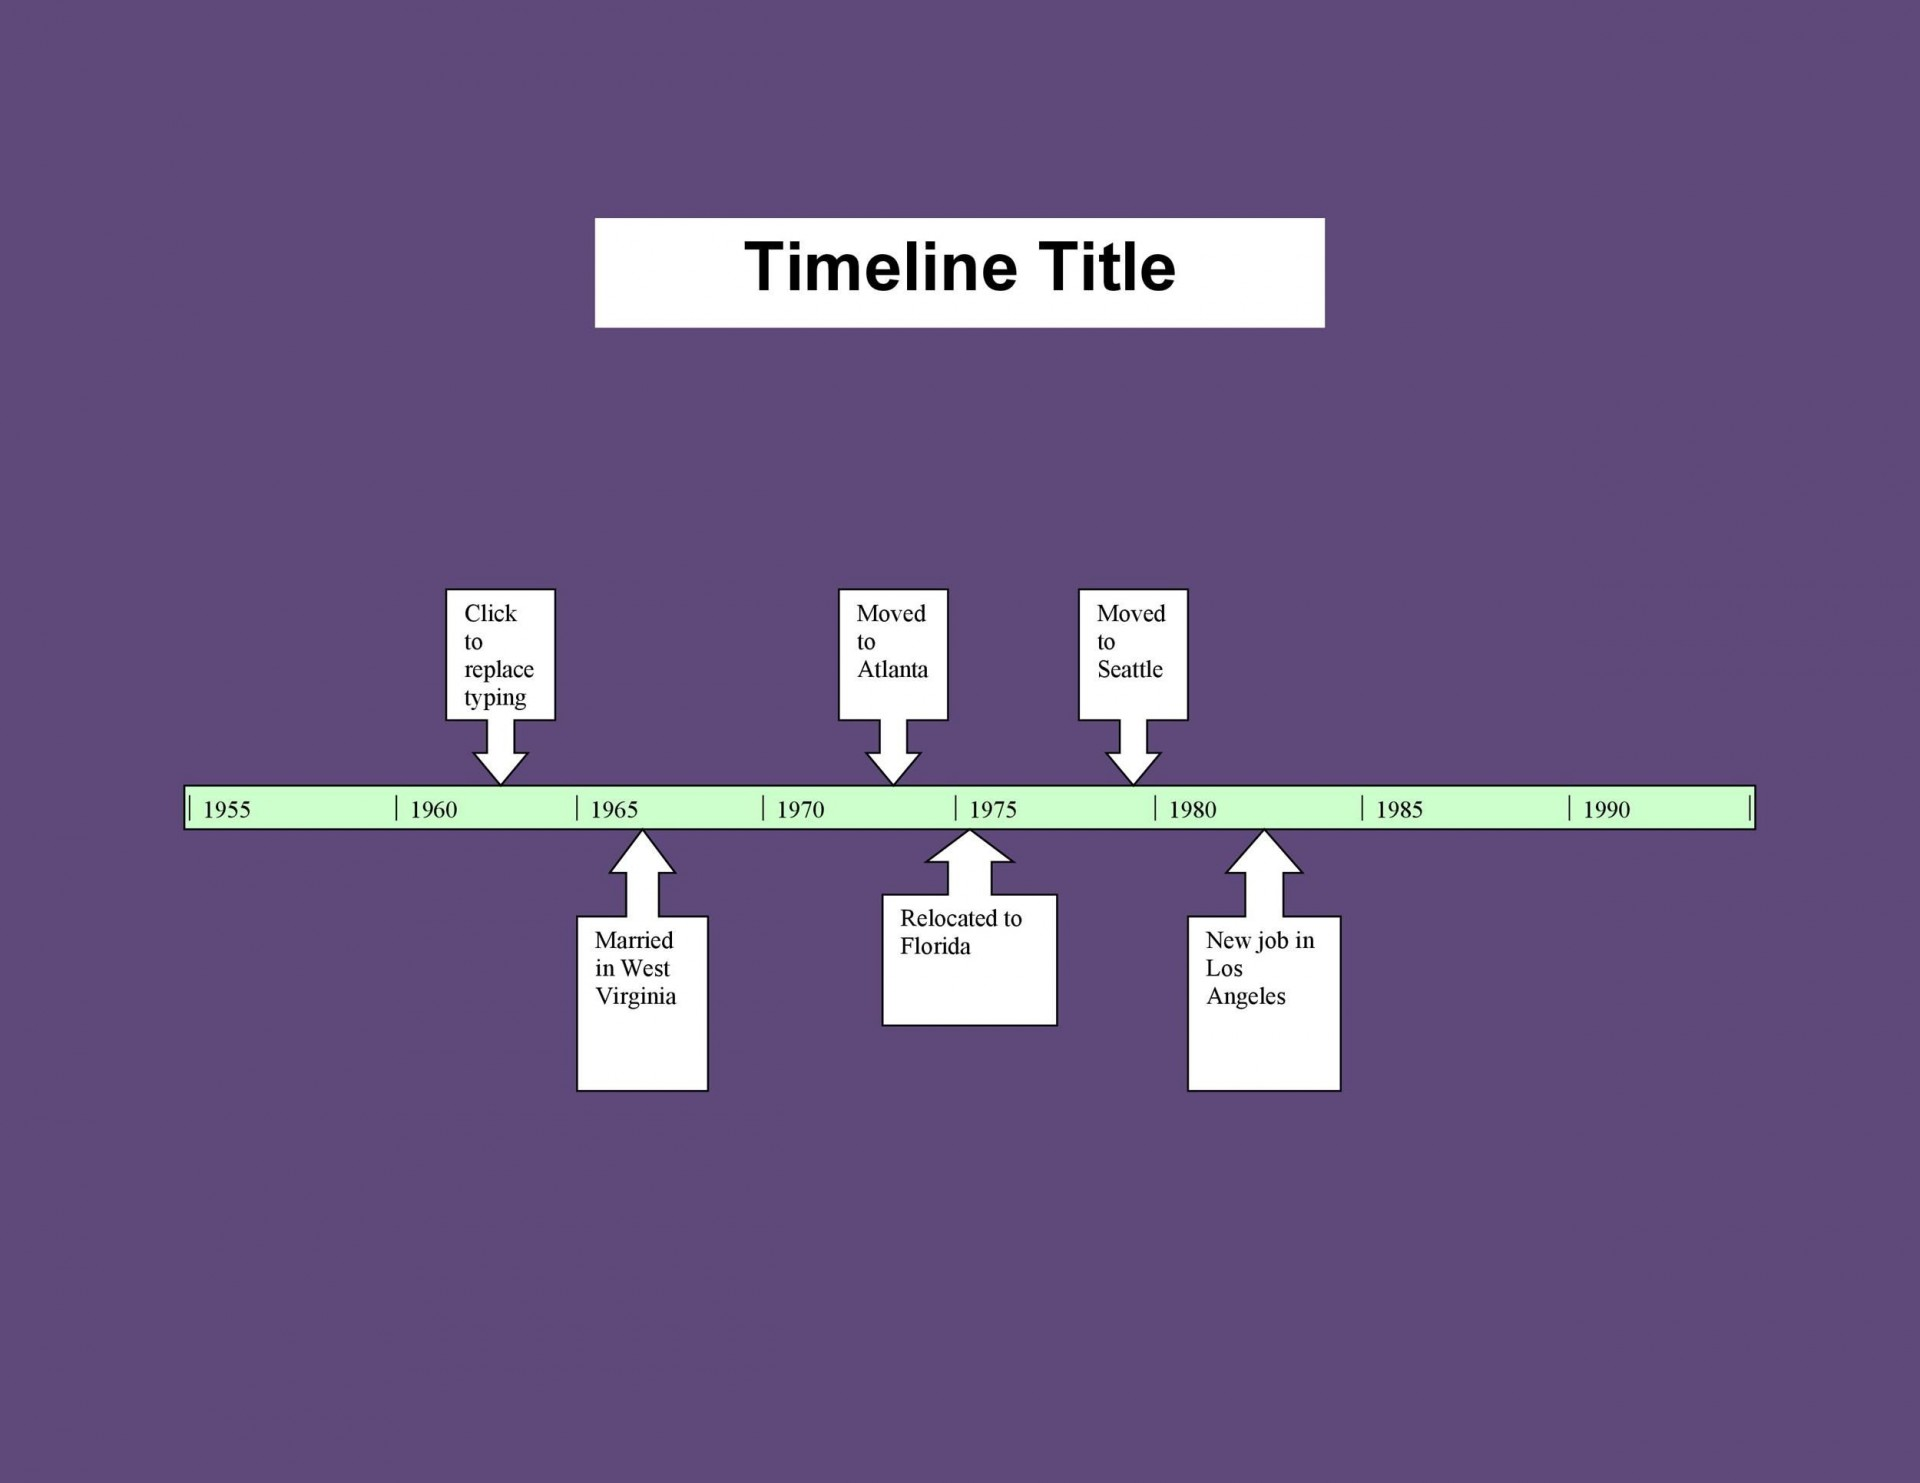 004 Stupendou Timeline Template In Word Idea  2010 Wordpres Free1920